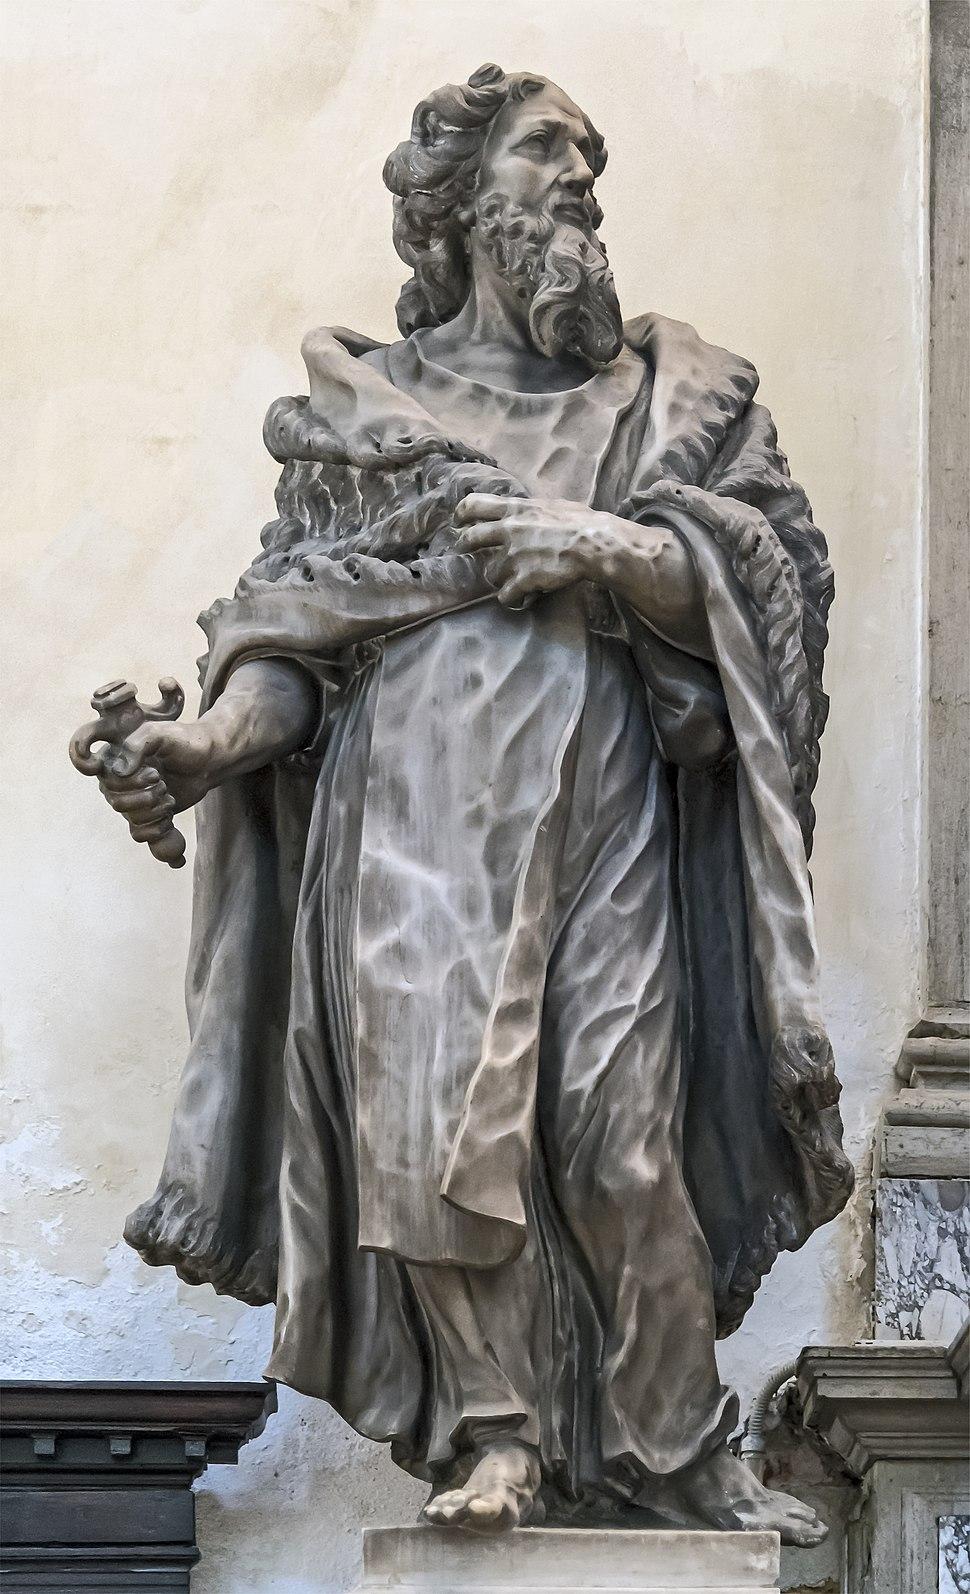 Santa Maria dei Carmini (Venice) - Chapel of St. Anthony of Padua - Elijah by Tommaso Rues